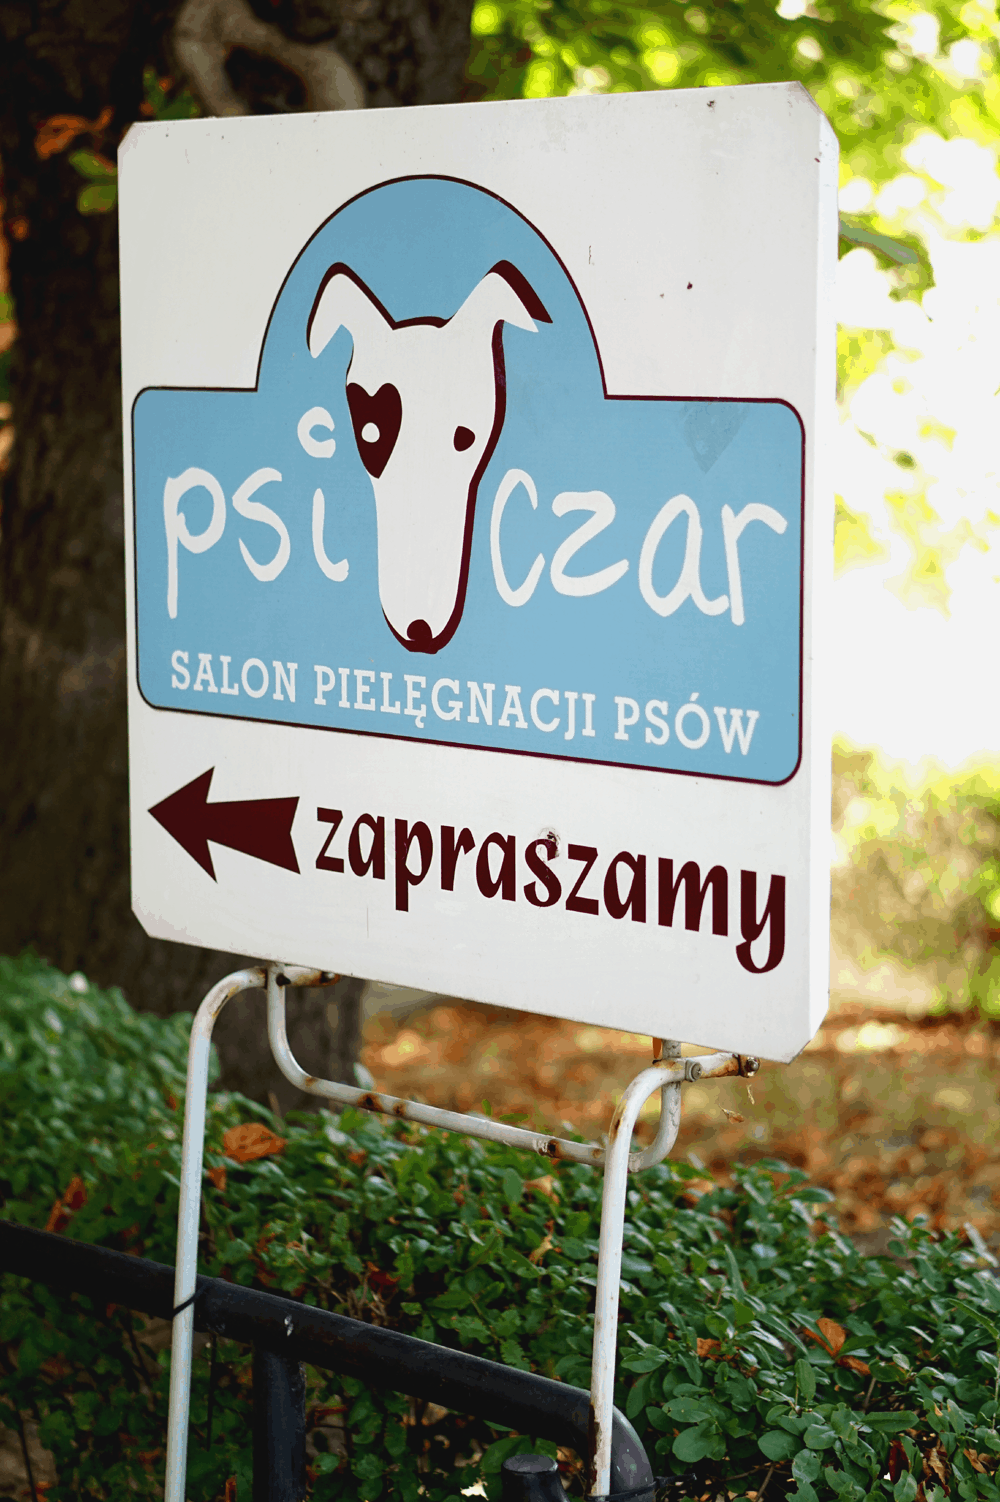 psi czar logo saska kępa